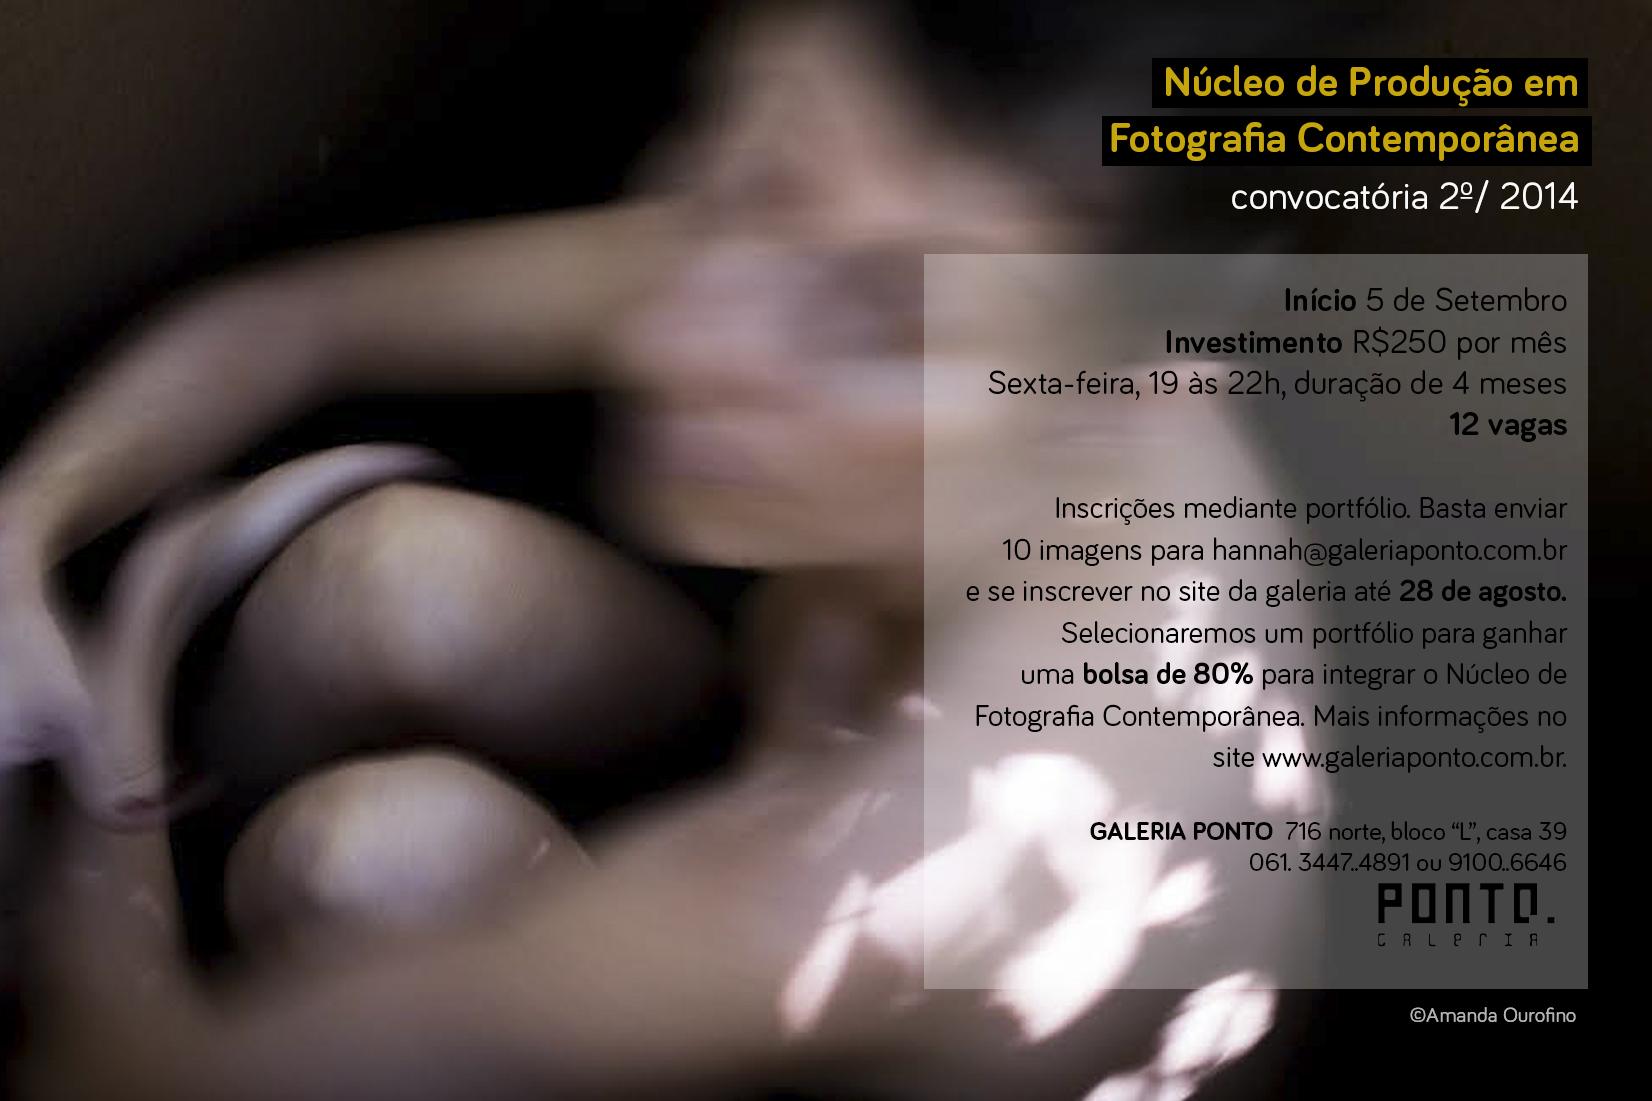 nucleodivulgação.jpg